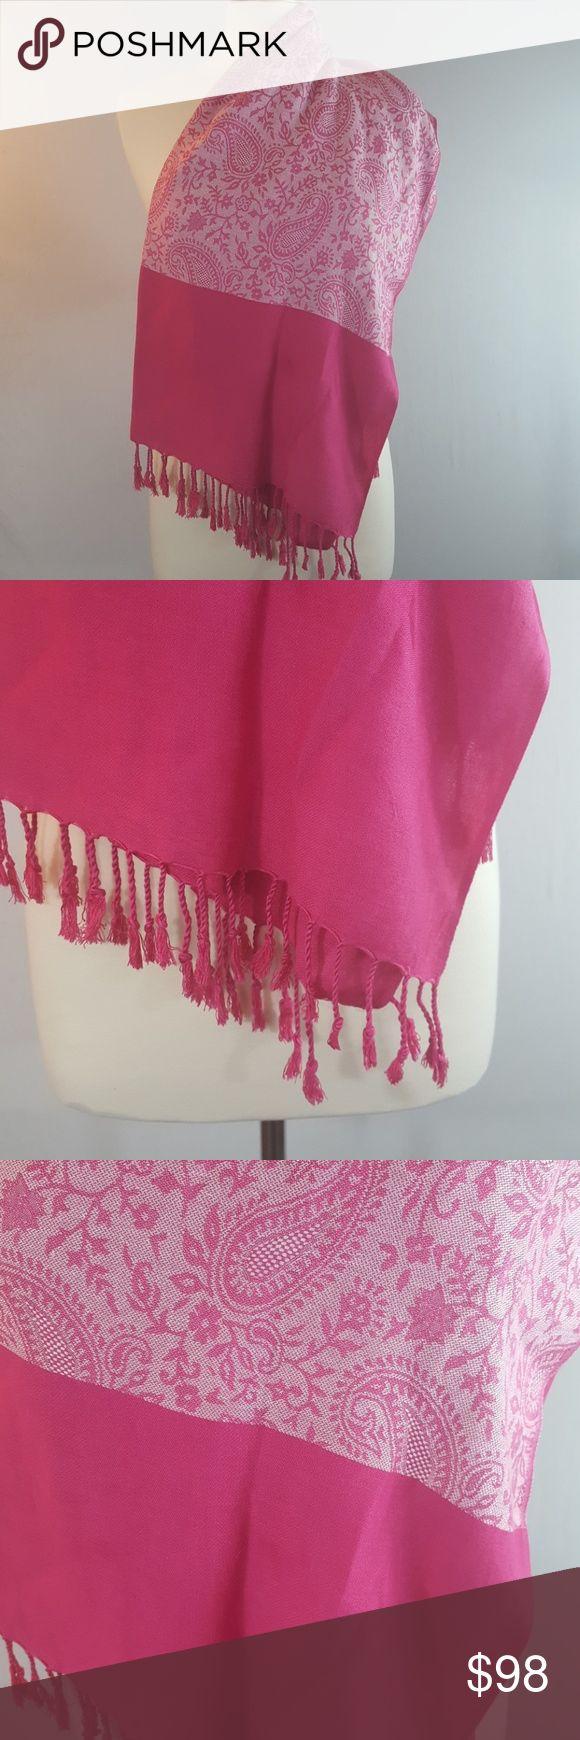 {pashmina} NWT Pink Paisley Shawl | Scarf Authentic Pashmina Kashmir Pink Paisley pattern 30x65 pashmina Accessories Scarves & Wraps